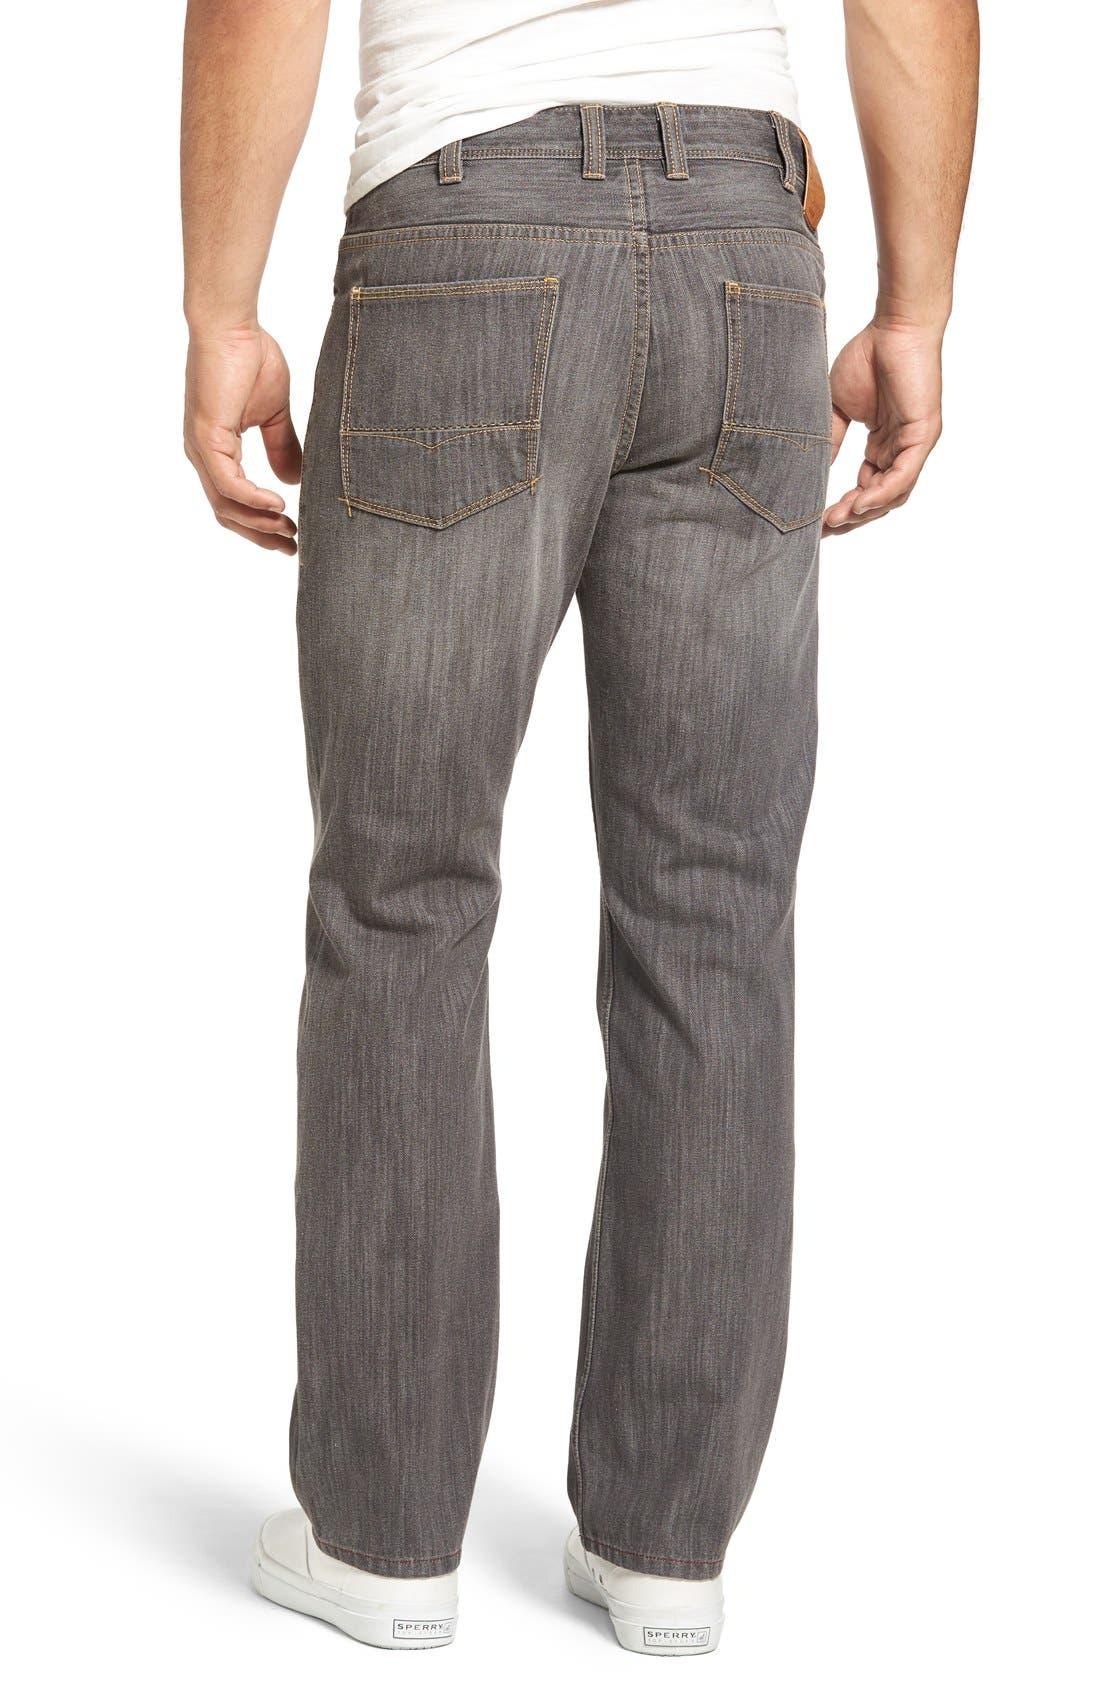 Barbados Bootcut Jeans,                             Main thumbnail 1, color,                             050